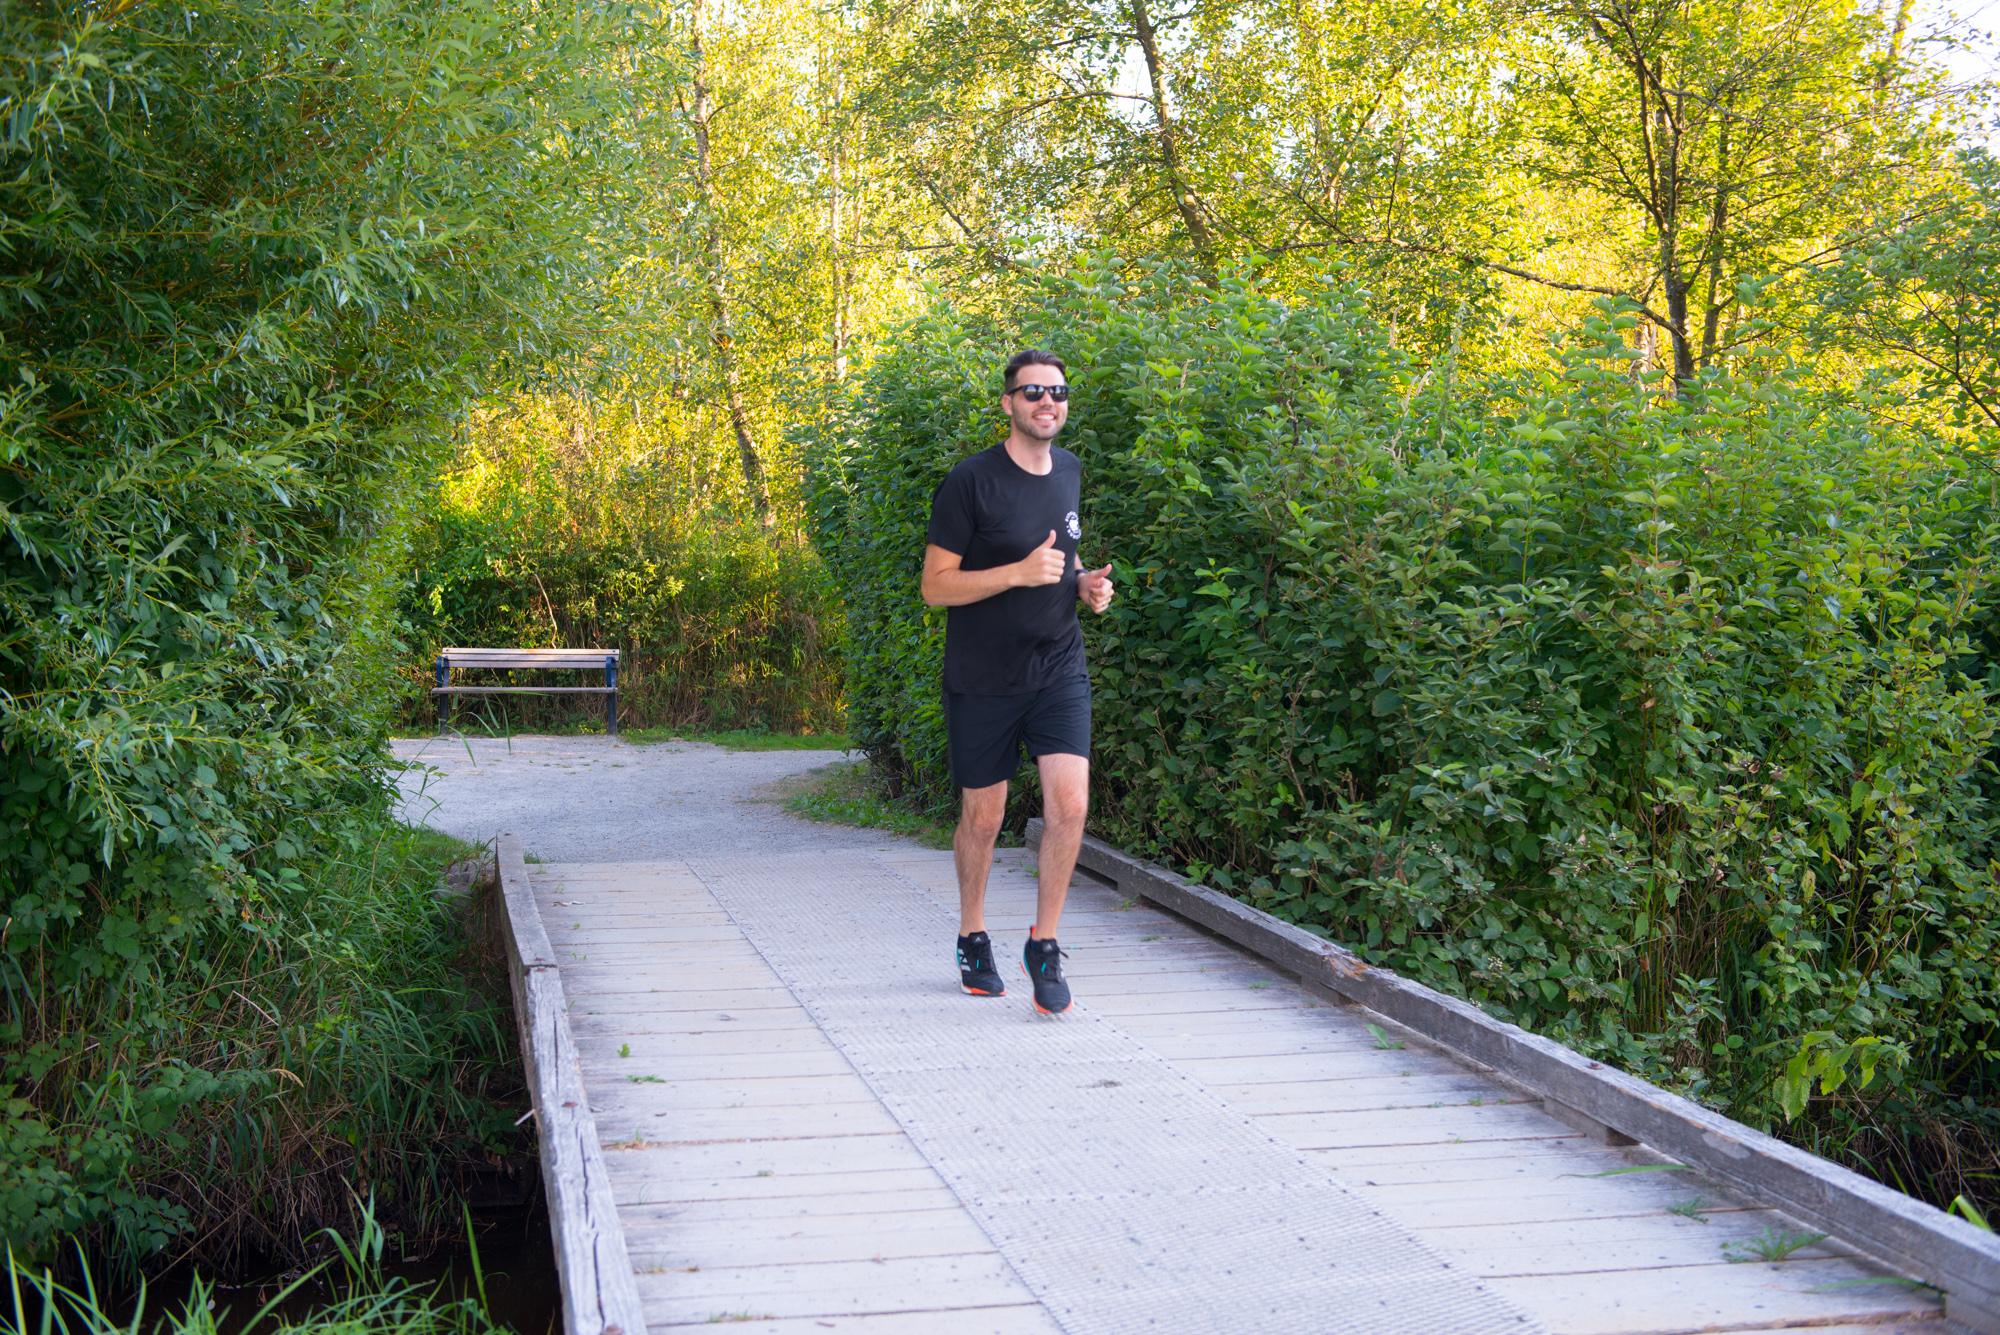 evan running on bridge.jpg